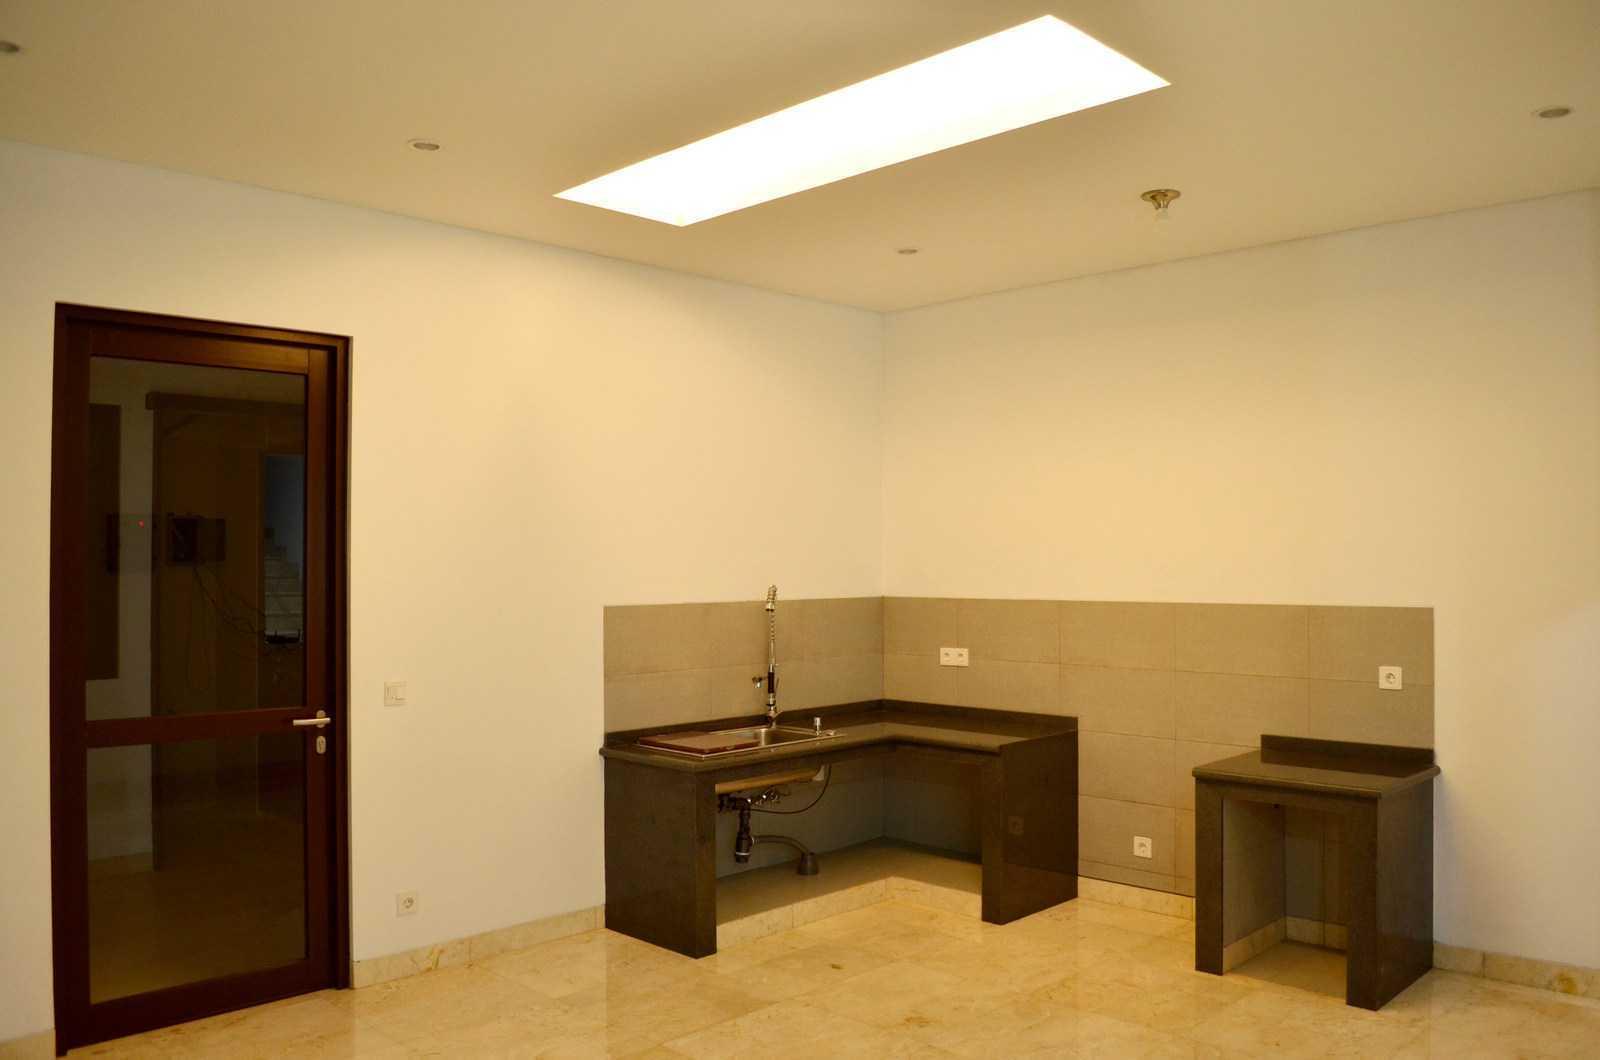 X3M Architects Nittaya A3 15 House Bsd Bsd Kitchen   25316